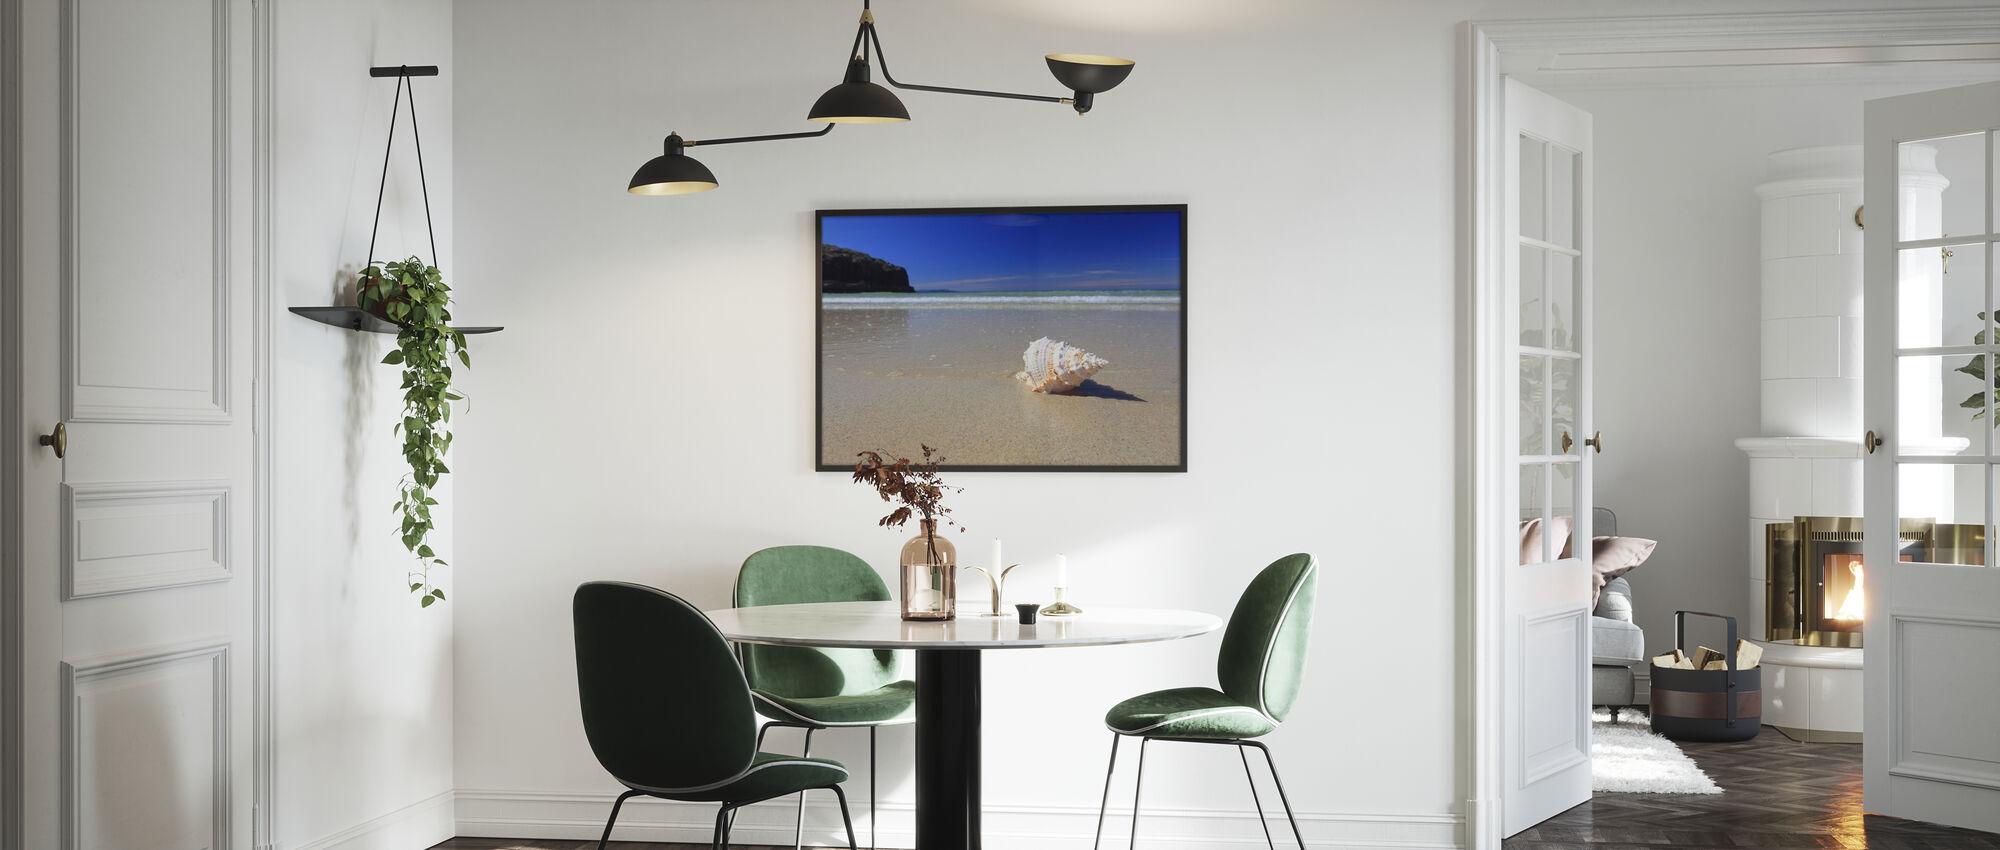 Shell on Beach - Framed print - Kitchen